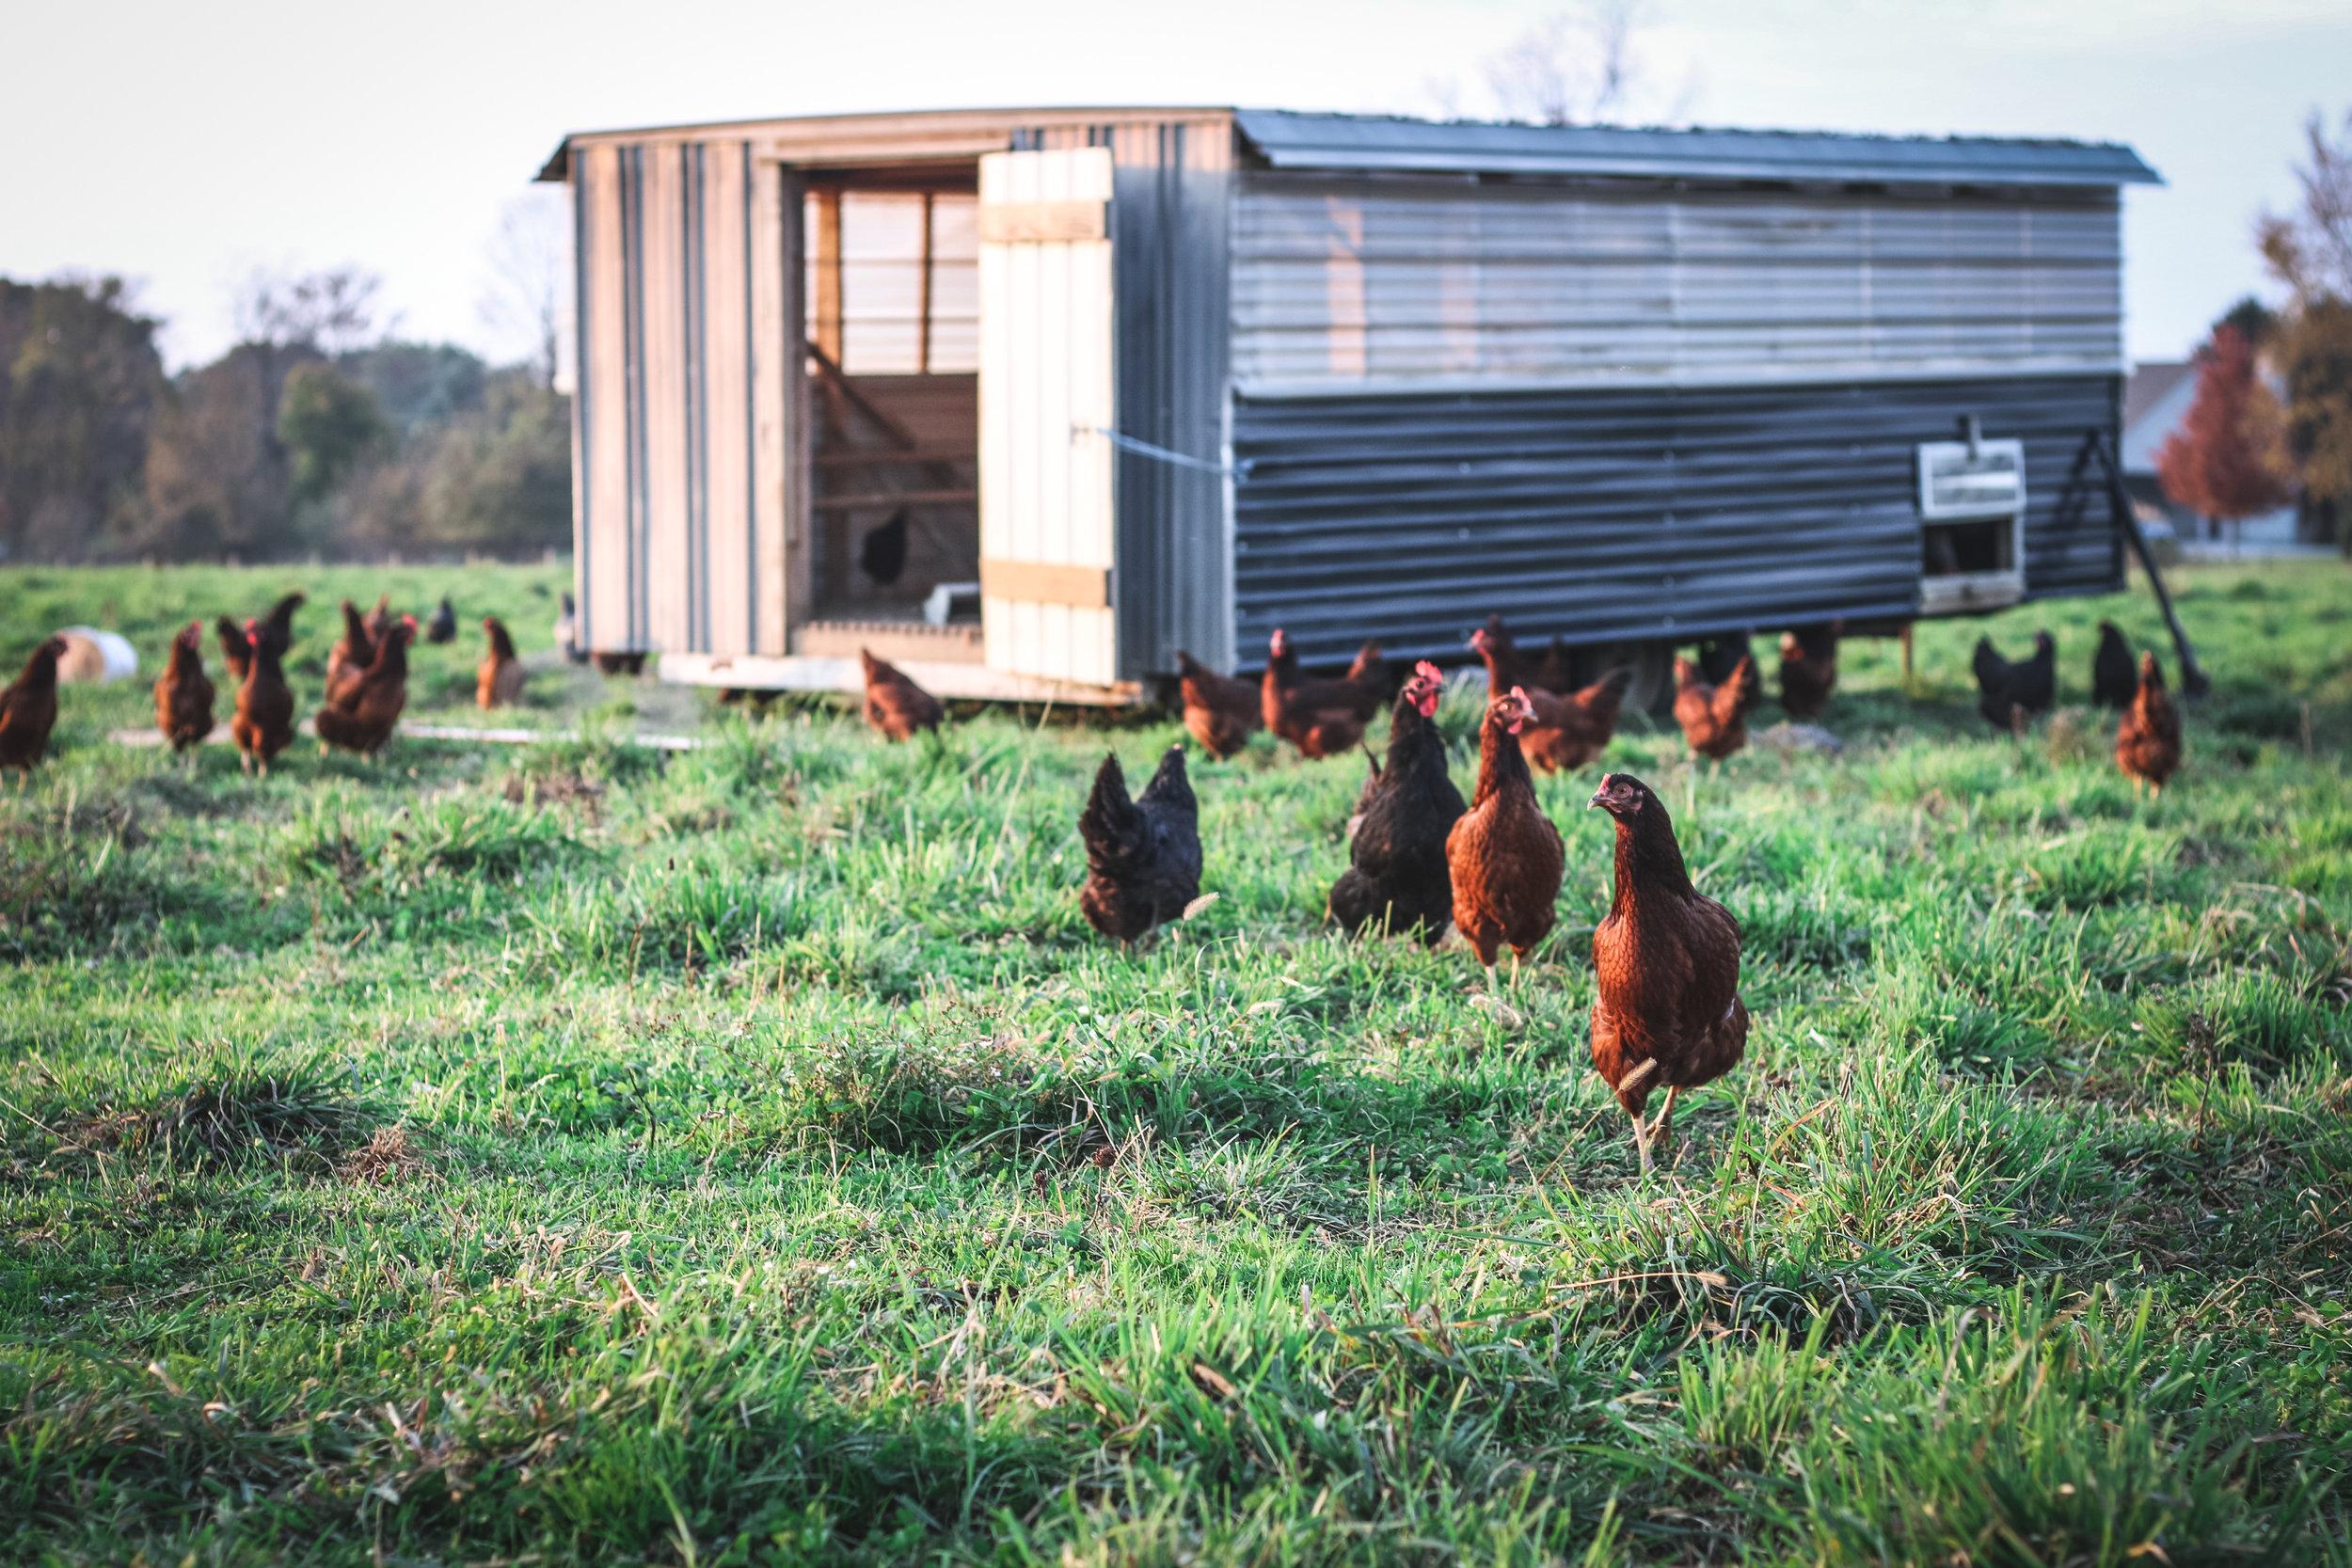 Freedom Acres Farm - 1043 Compass Road, Honeybrook, PA 19344sam.freedomacres@gmail.com610-451-8417